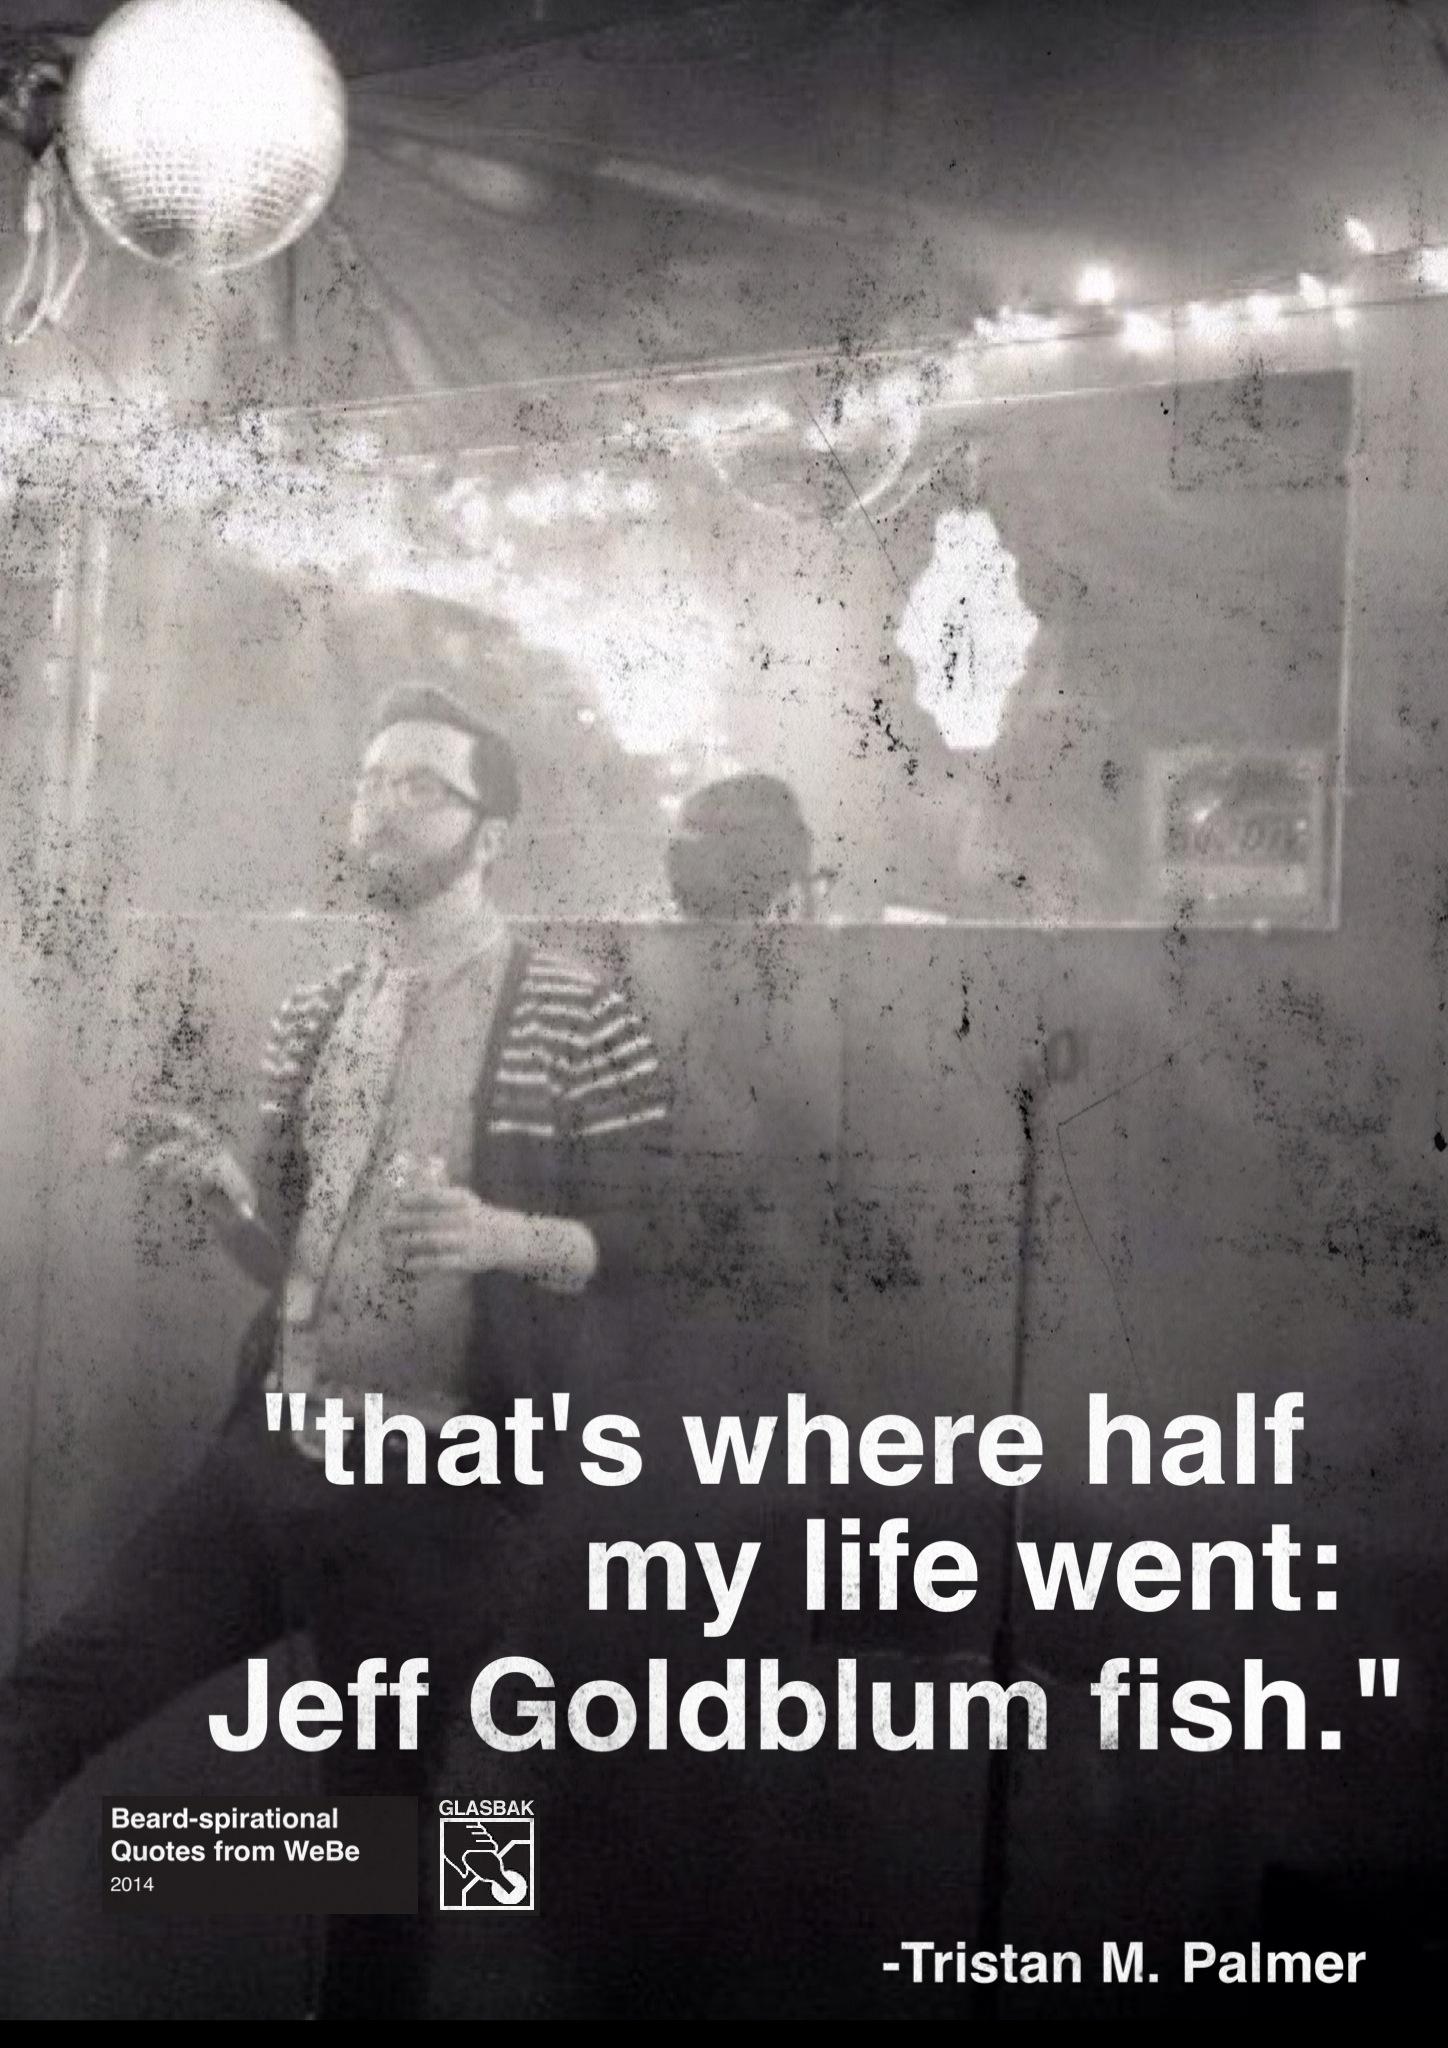 2014-02-17_jeff goldblum fish.jpg